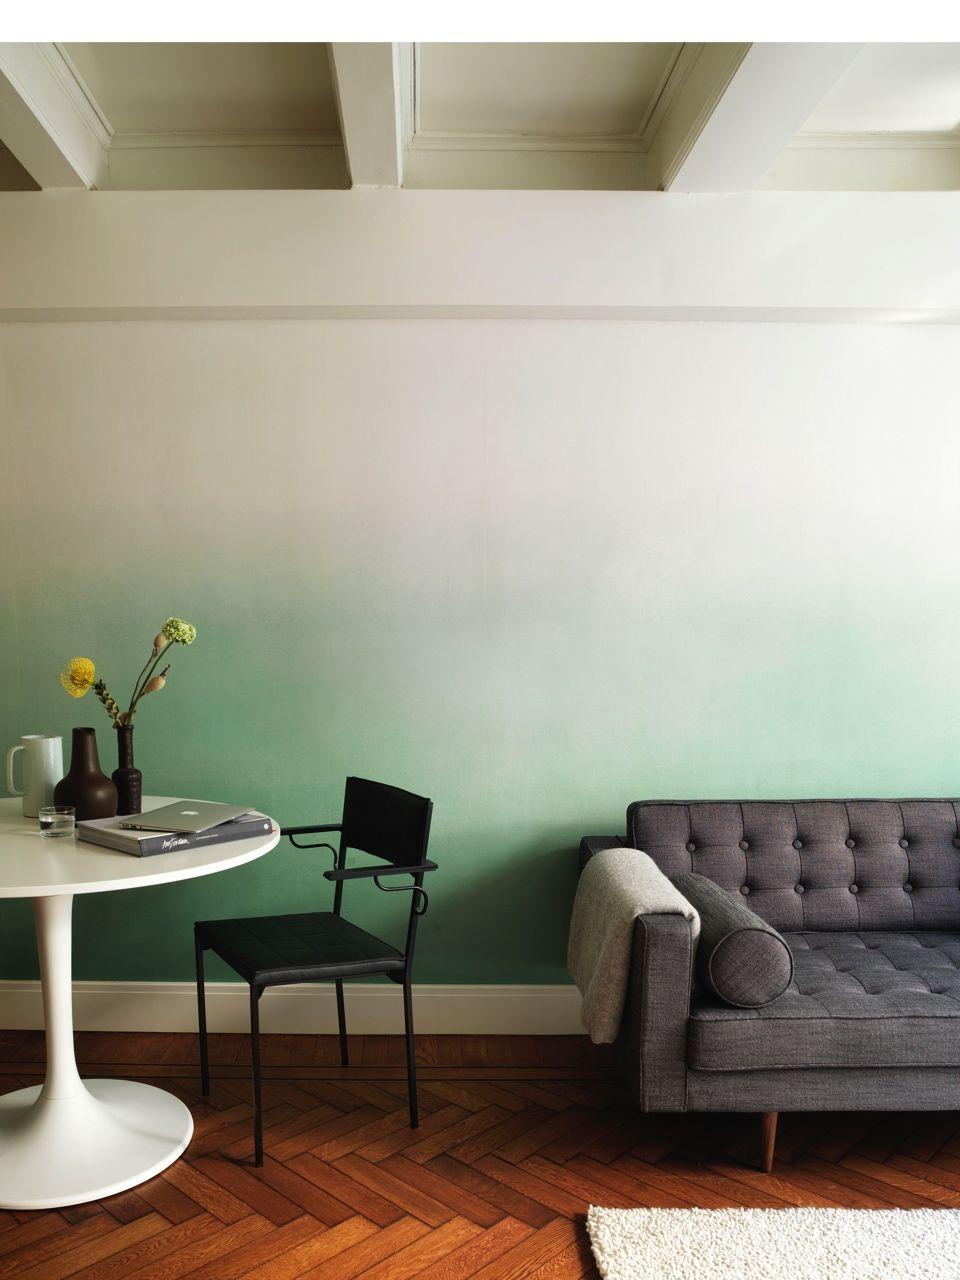 villa nicola amsterdam wohn design. Black Bedroom Furniture Sets. Home Design Ideas